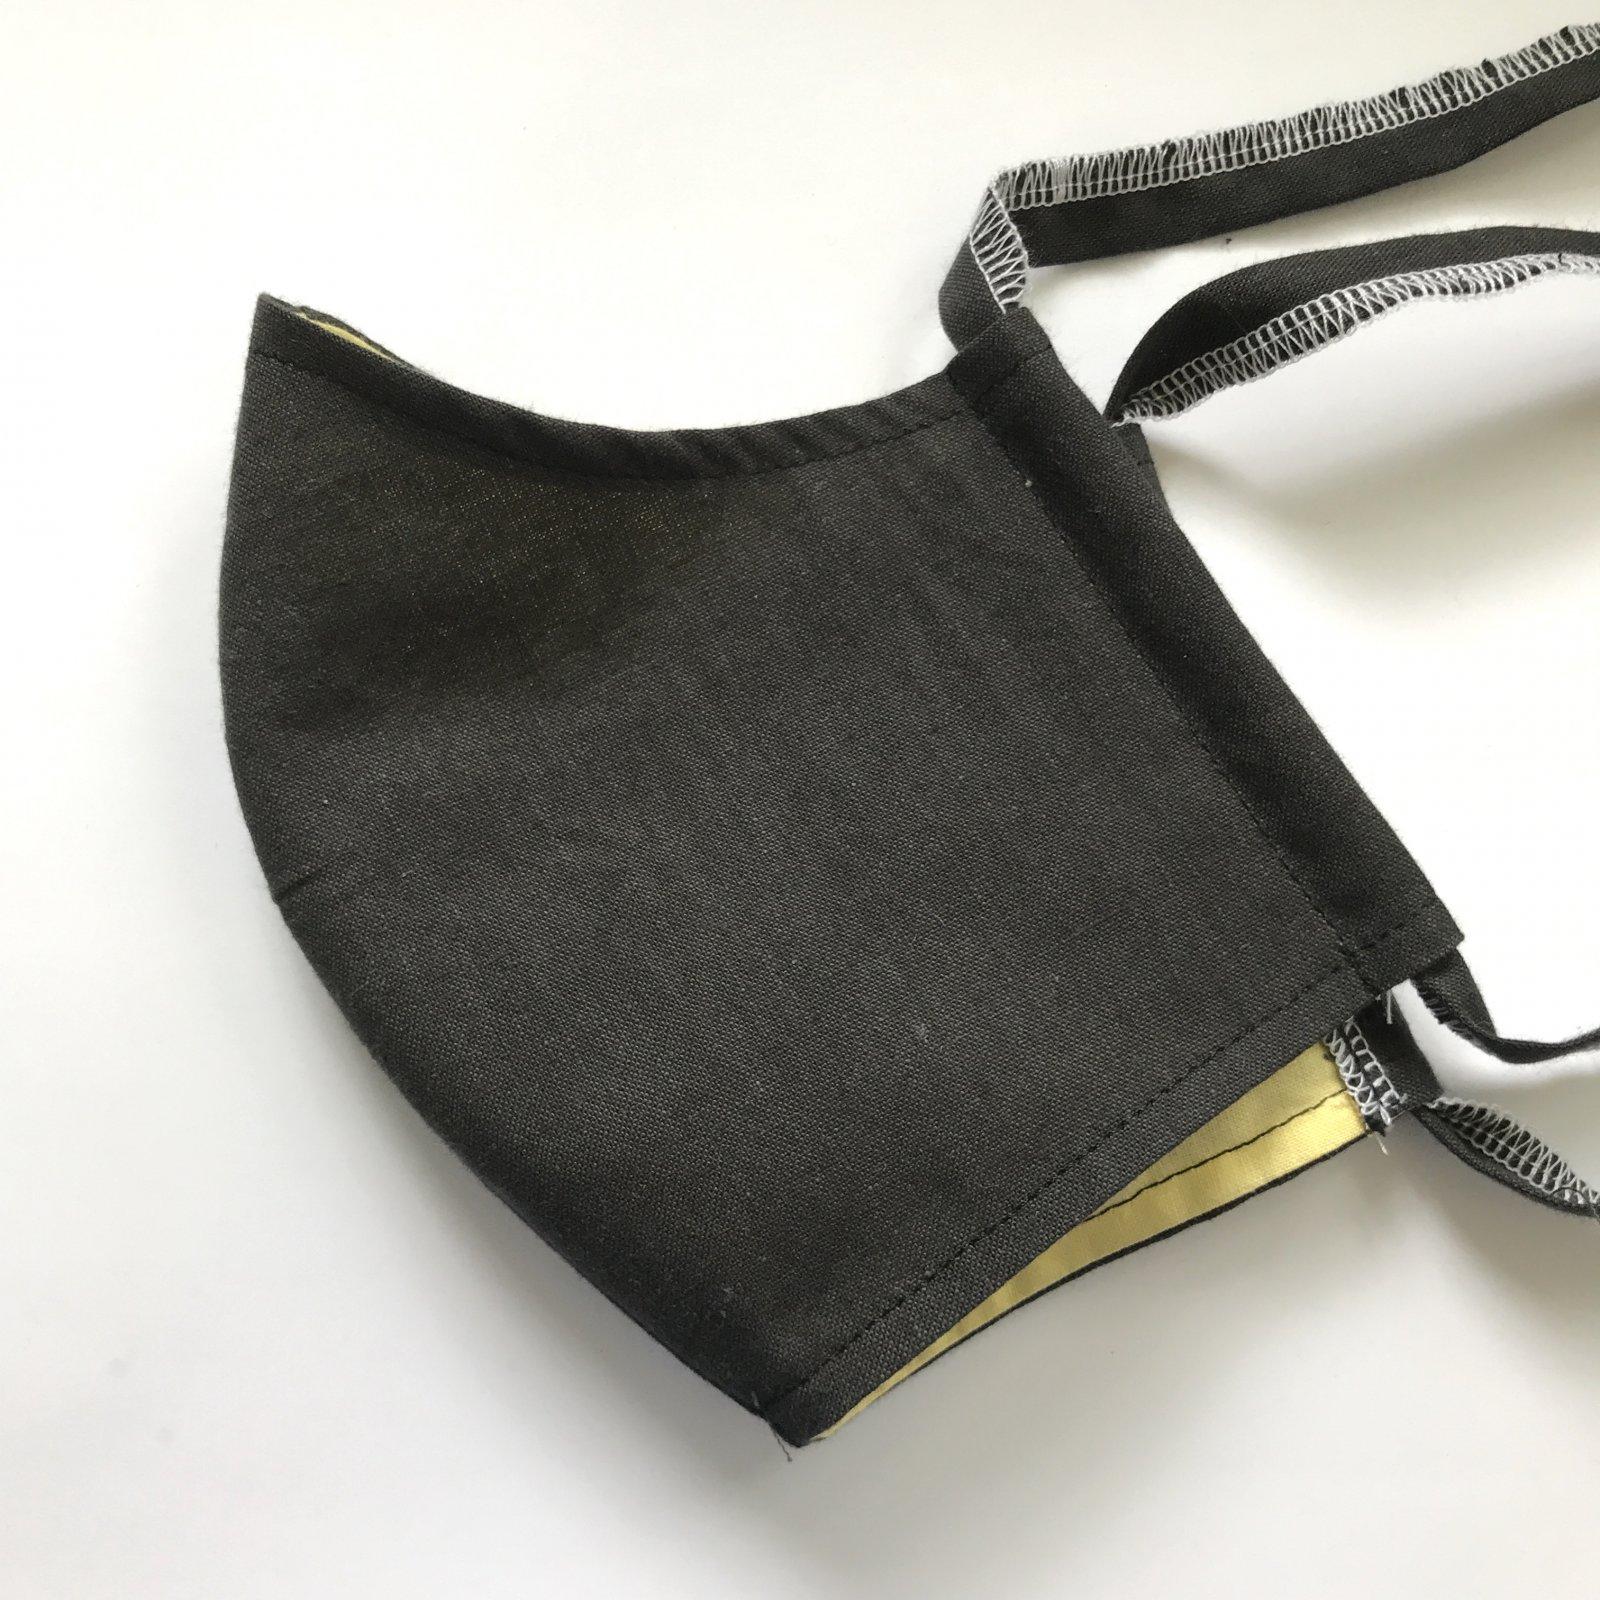 Adult Size Contoured Cotton Drawstring Mask - Black